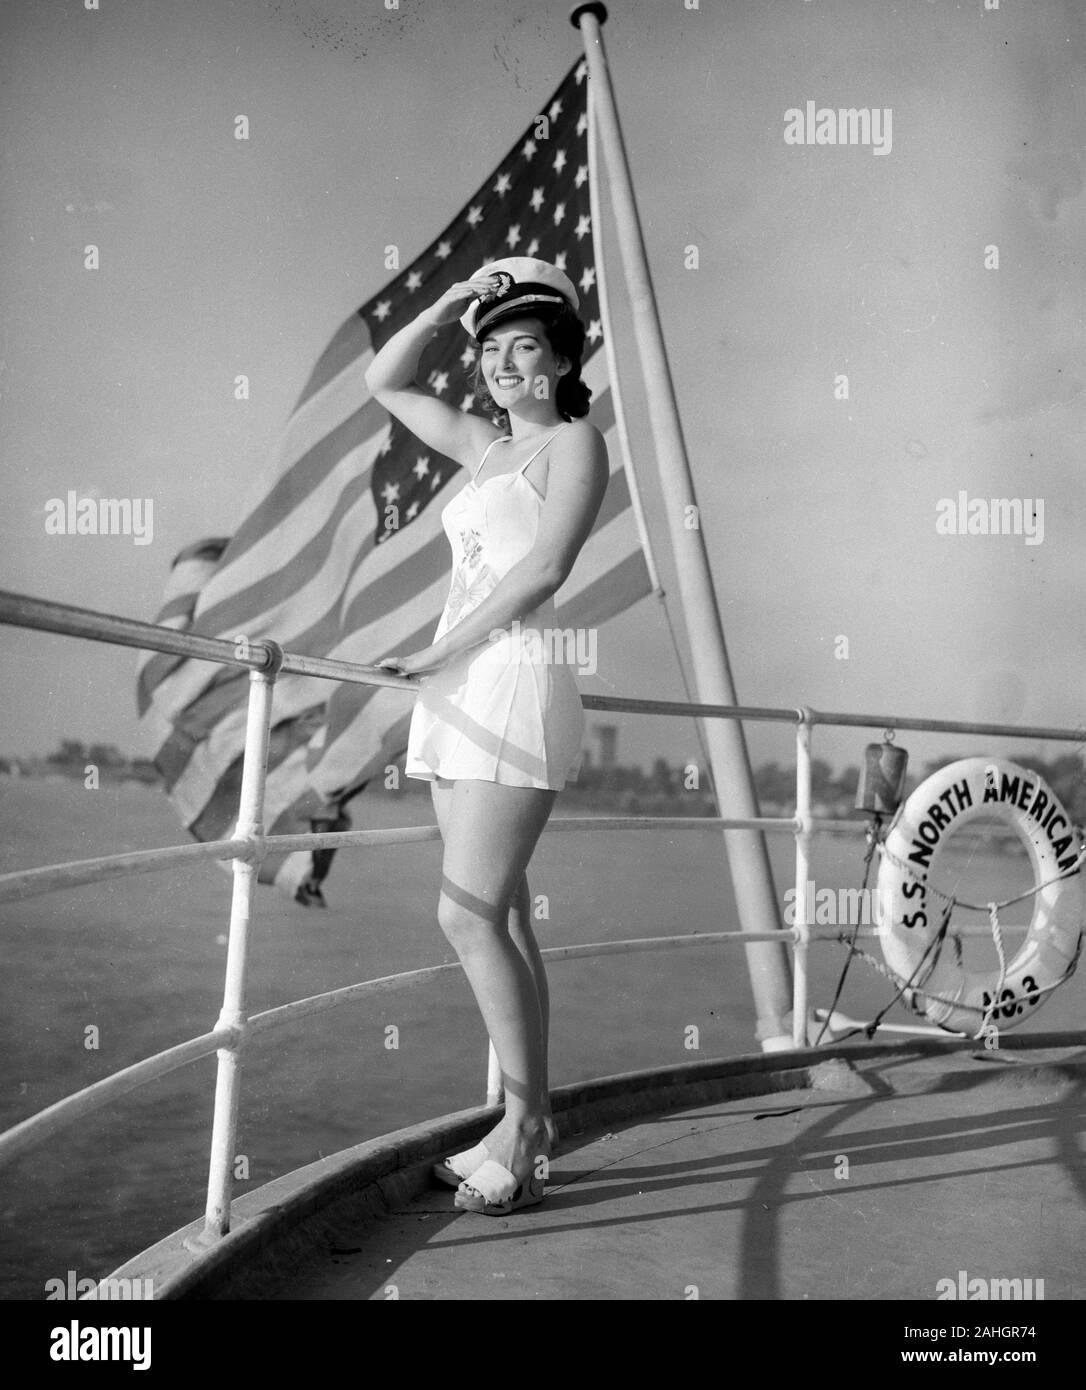 Passagier an Bord der SS Nordamerika 1942 Stockfoto